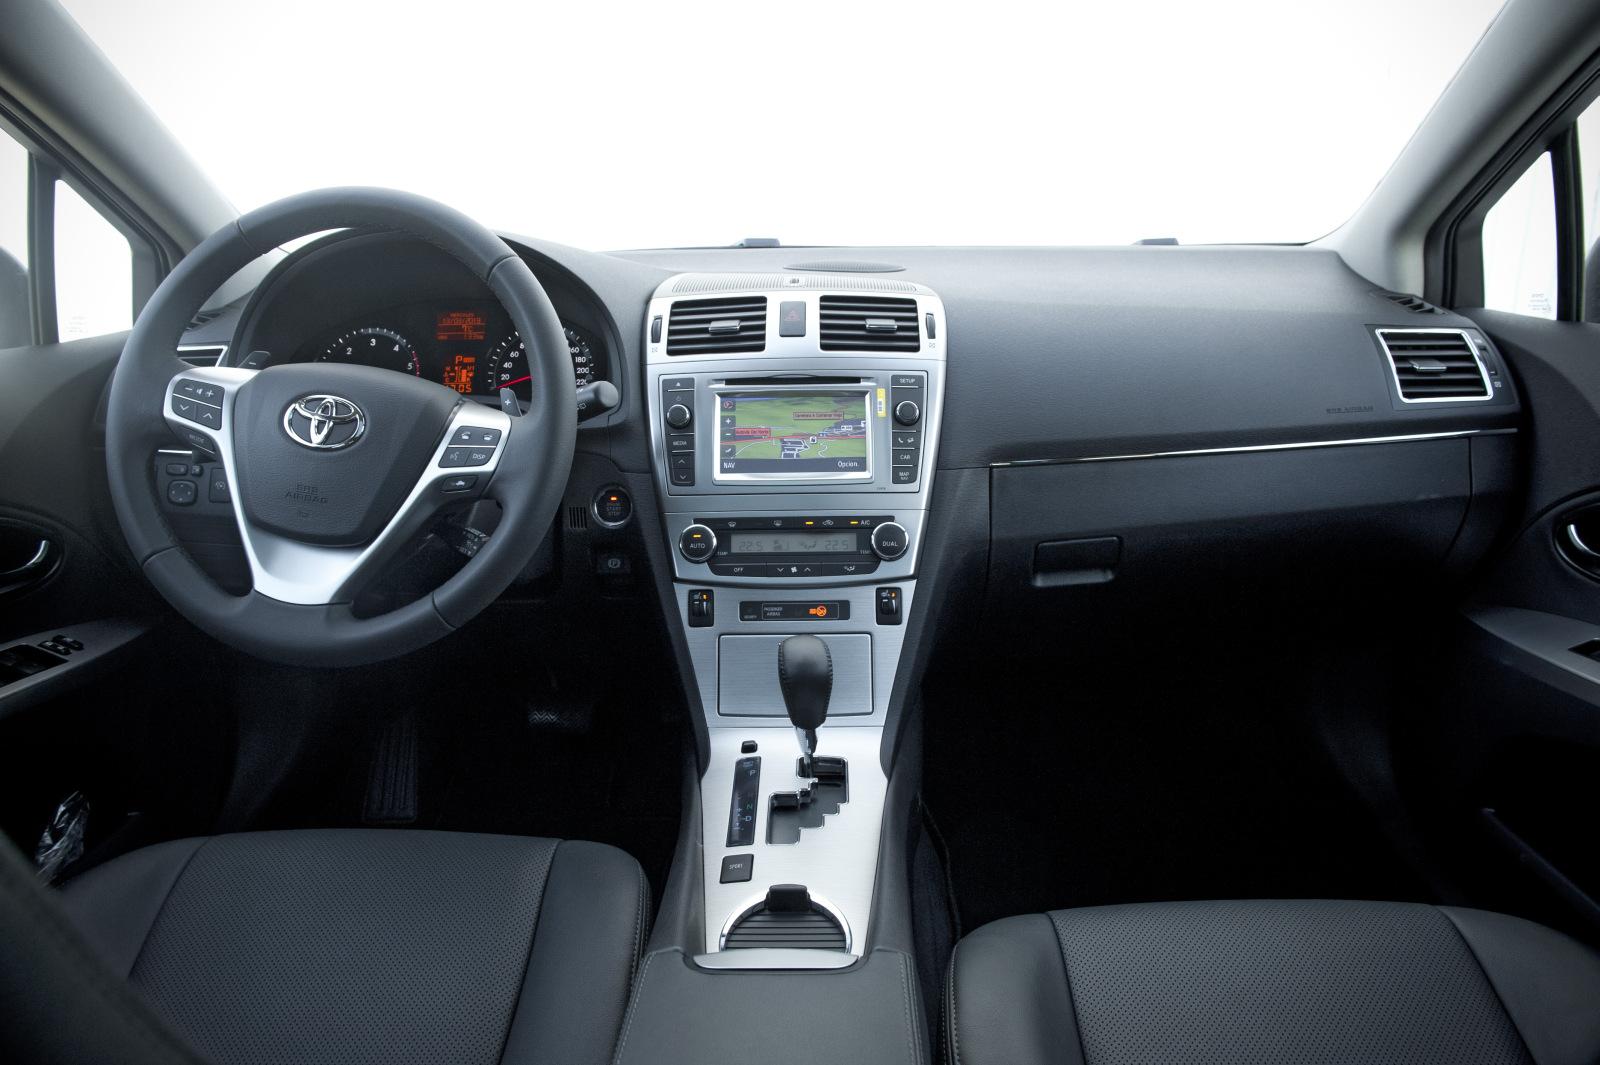 Toyota Avensis 2013 Renovaci 243 N De La Gama